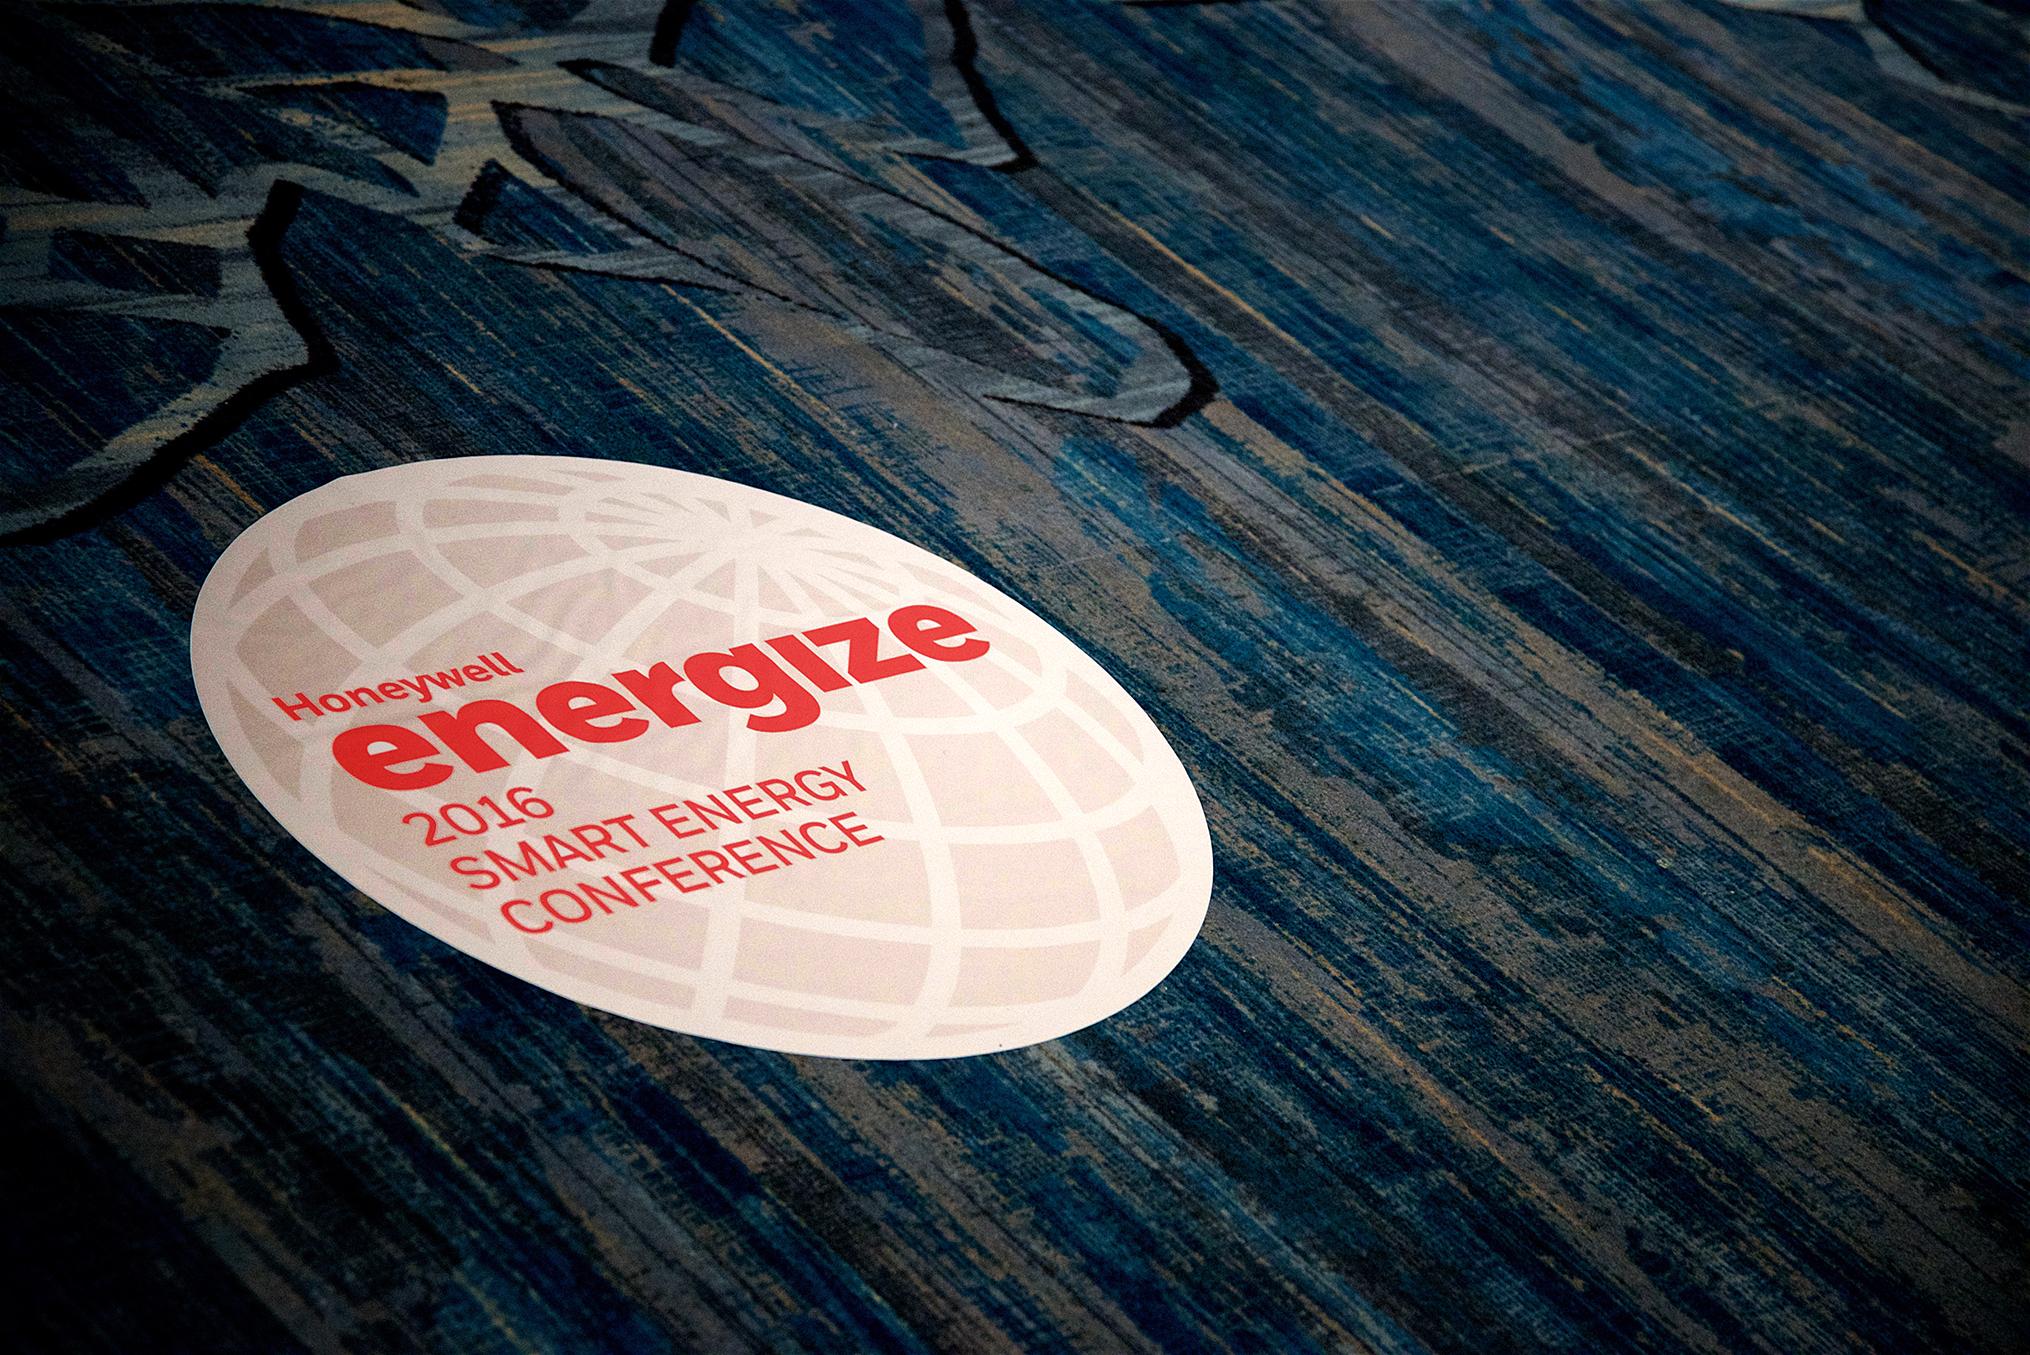 Floor Decal Honeywell Energize 2016 Orlando FL